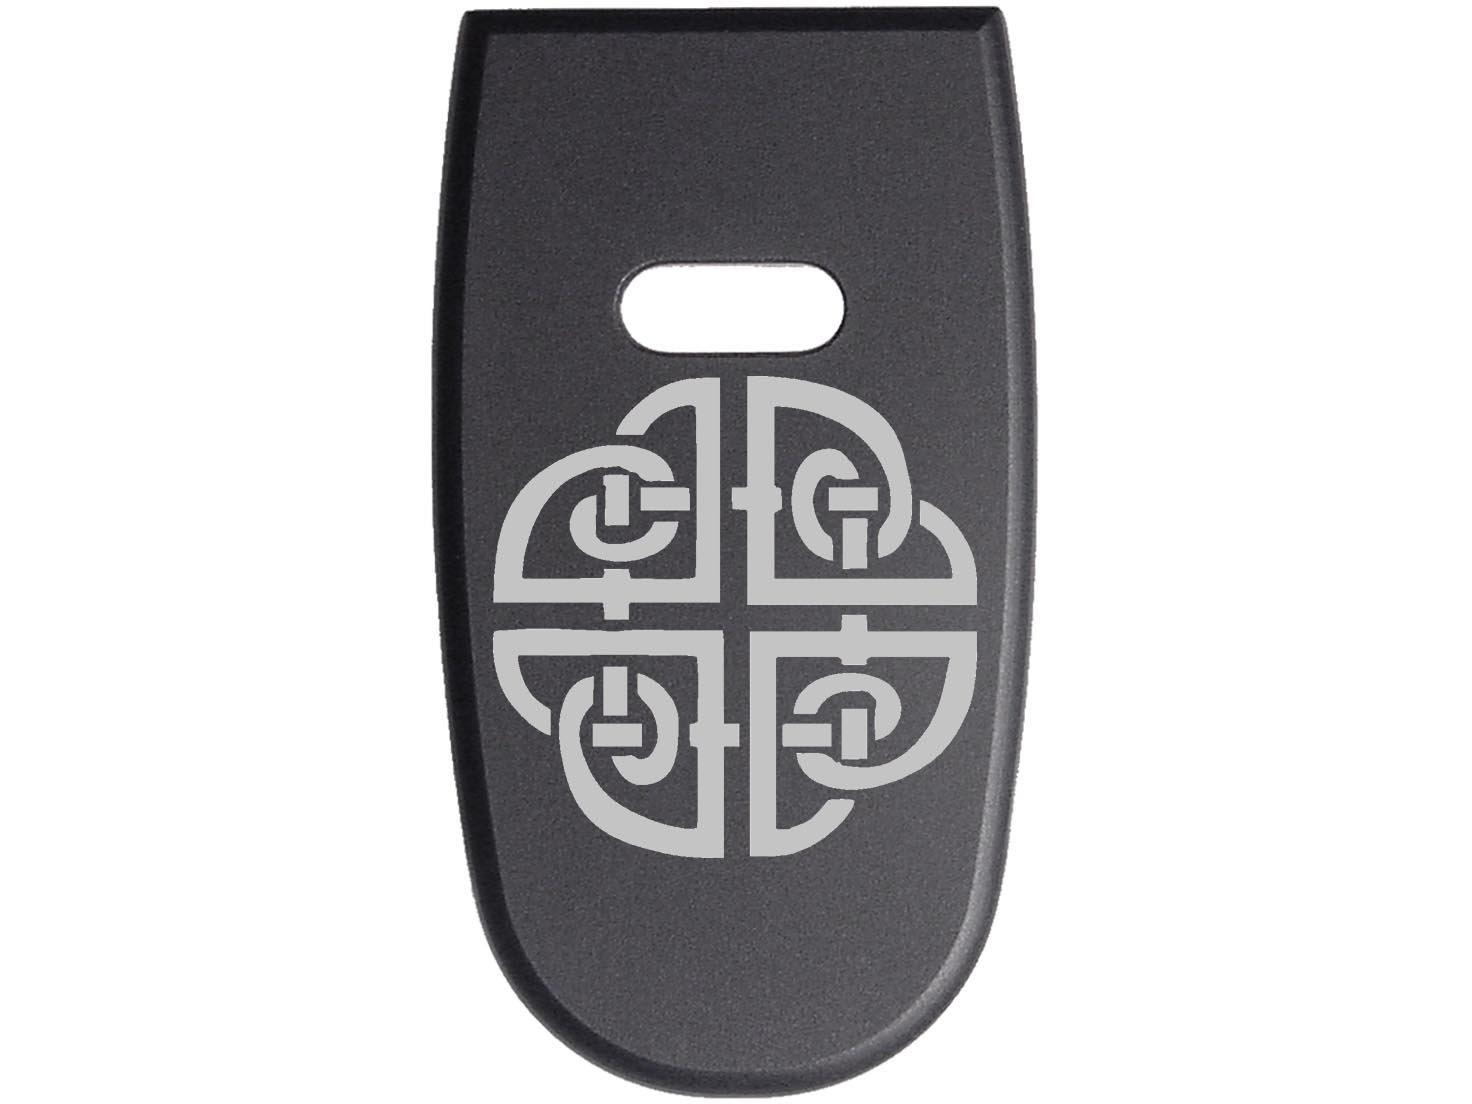 for S&W M&P Shield .45 Aluminum Floor Base Plate Black Custom Laser Engraved: Celtic Shield By NDZ Performance